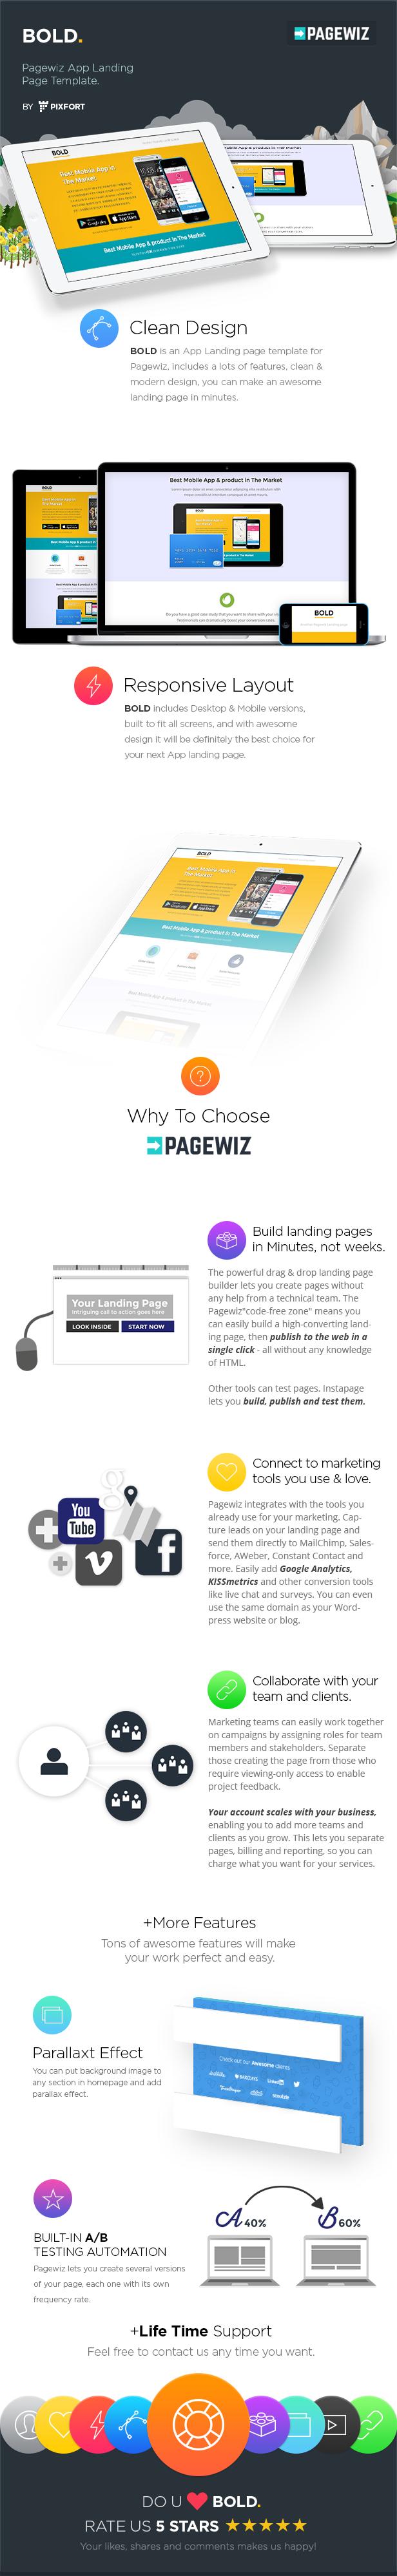 BOLD - Pagewiz App Landing Page Template - 3